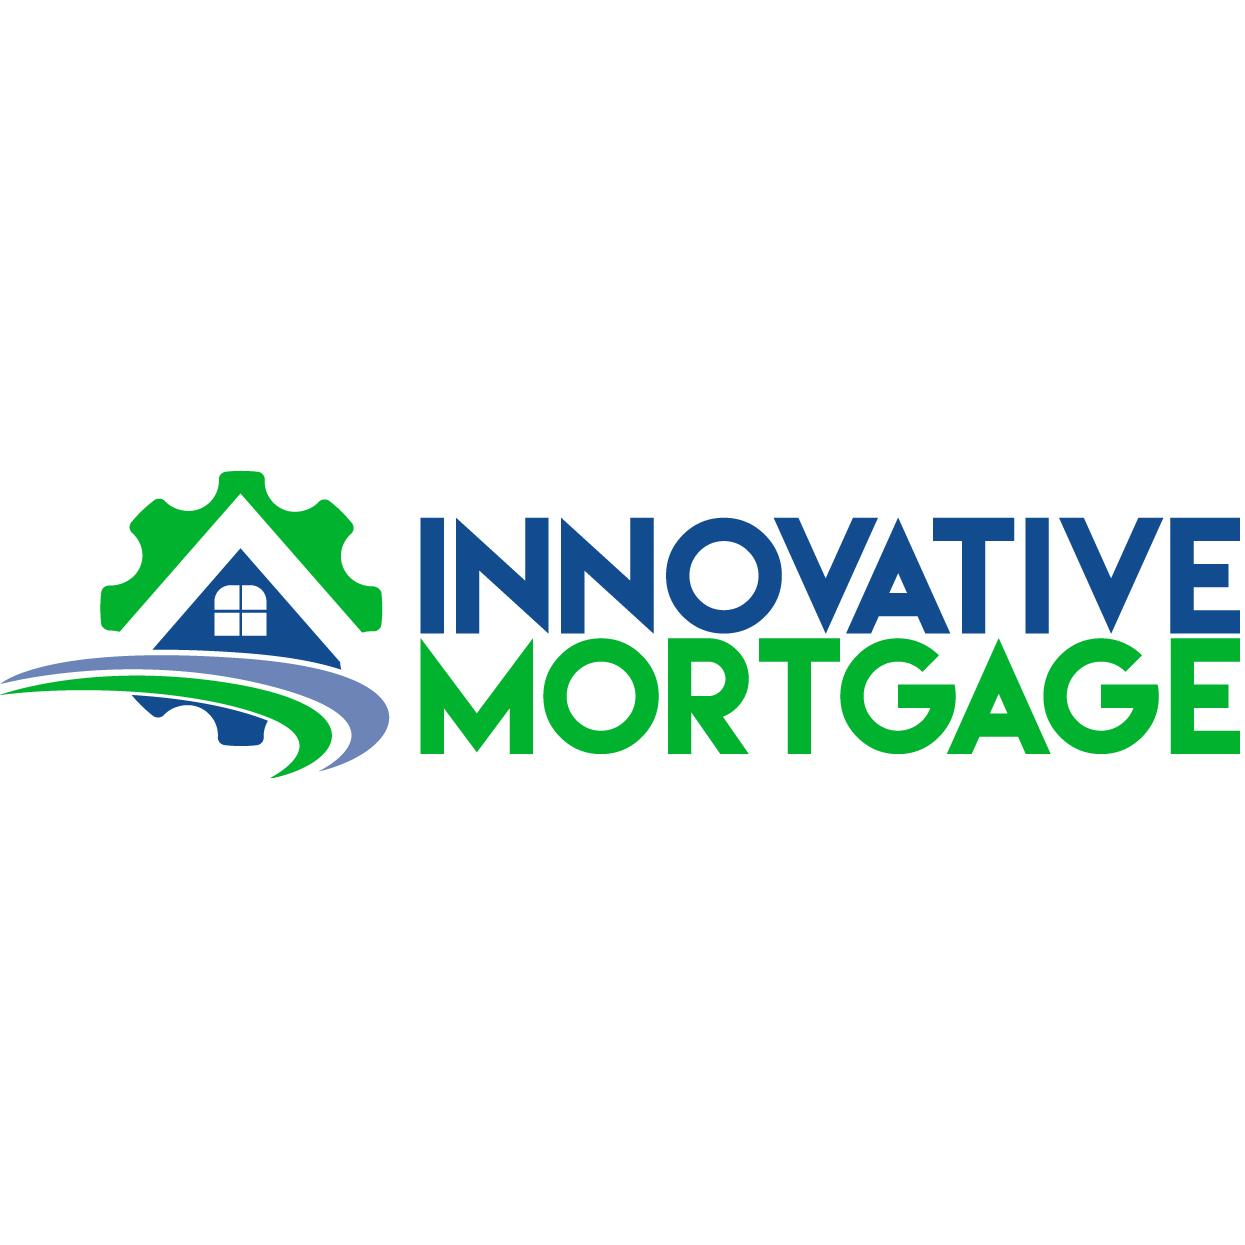 RJ Hanke - Innovative Mortgage Services - Port St. Lucie, FL 34952 - (772)261-2400 | ShowMeLocal.com